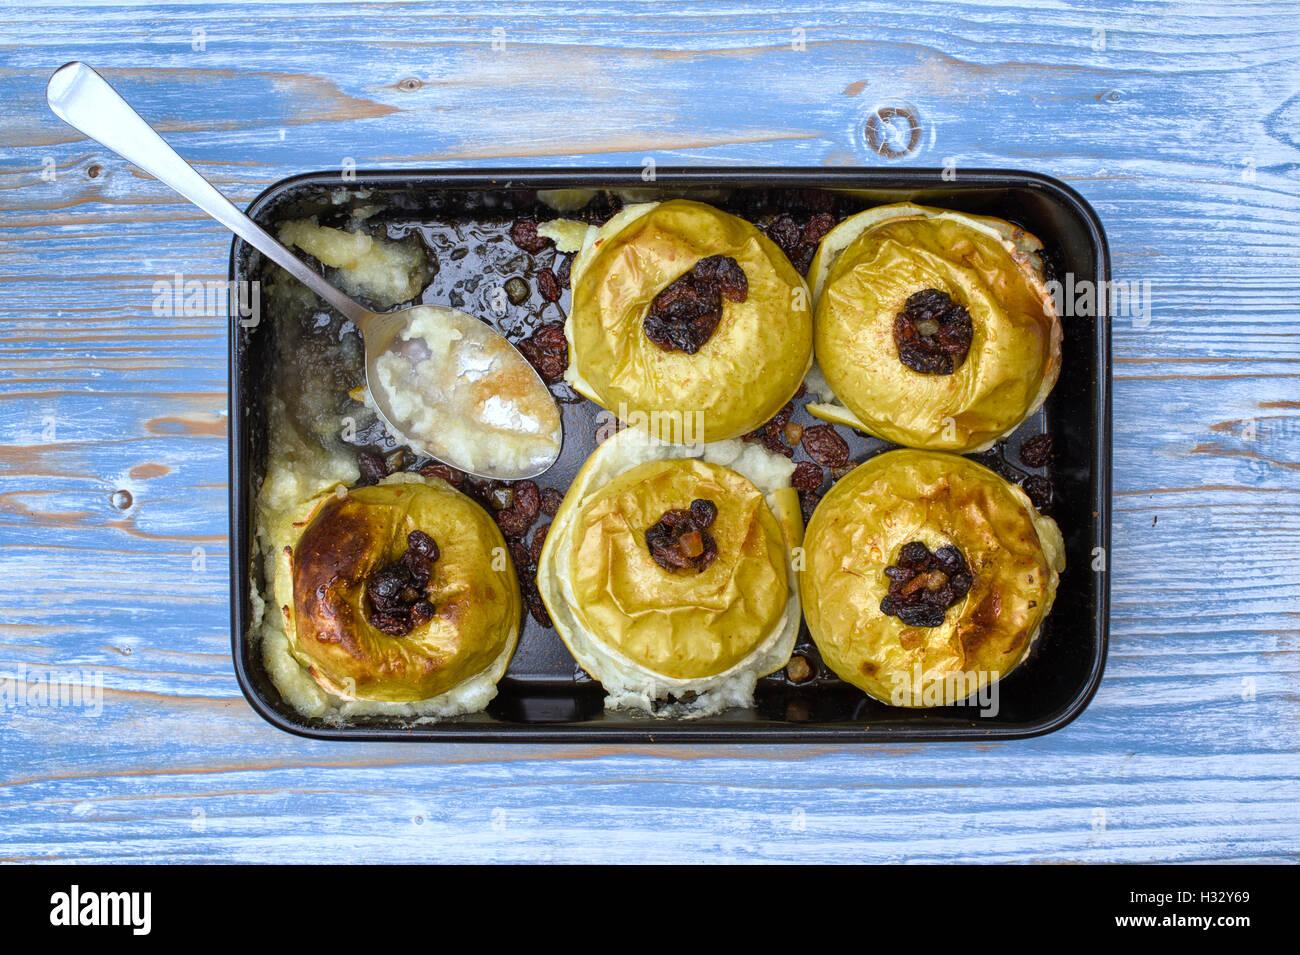 Homemade Baked Apples - Stock Image